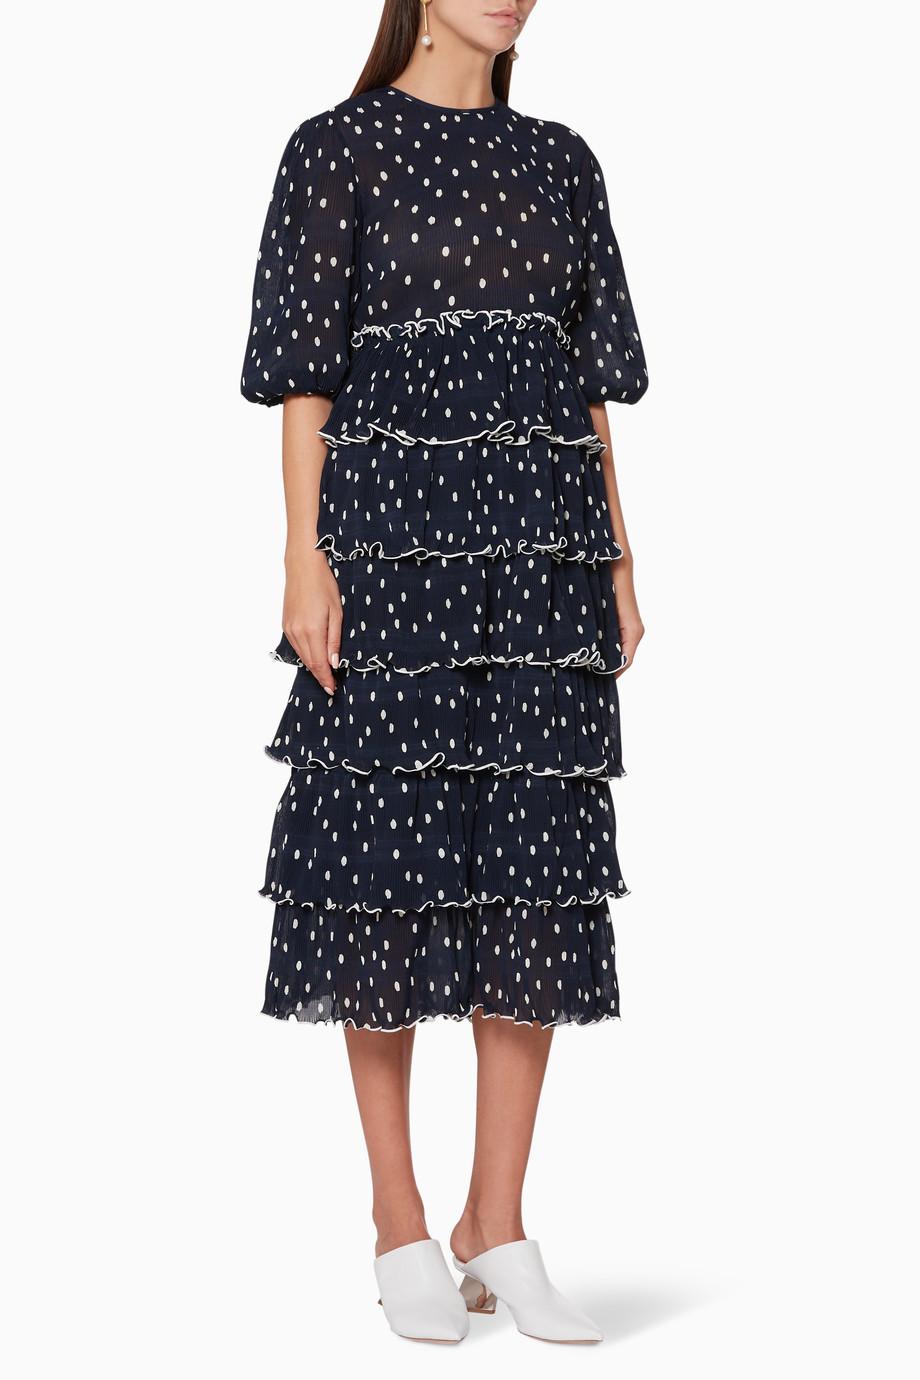 9dc08bfbd4 Shop Ganni Blue Lowell Dot Print Ruffled Tier Dress for Women ...